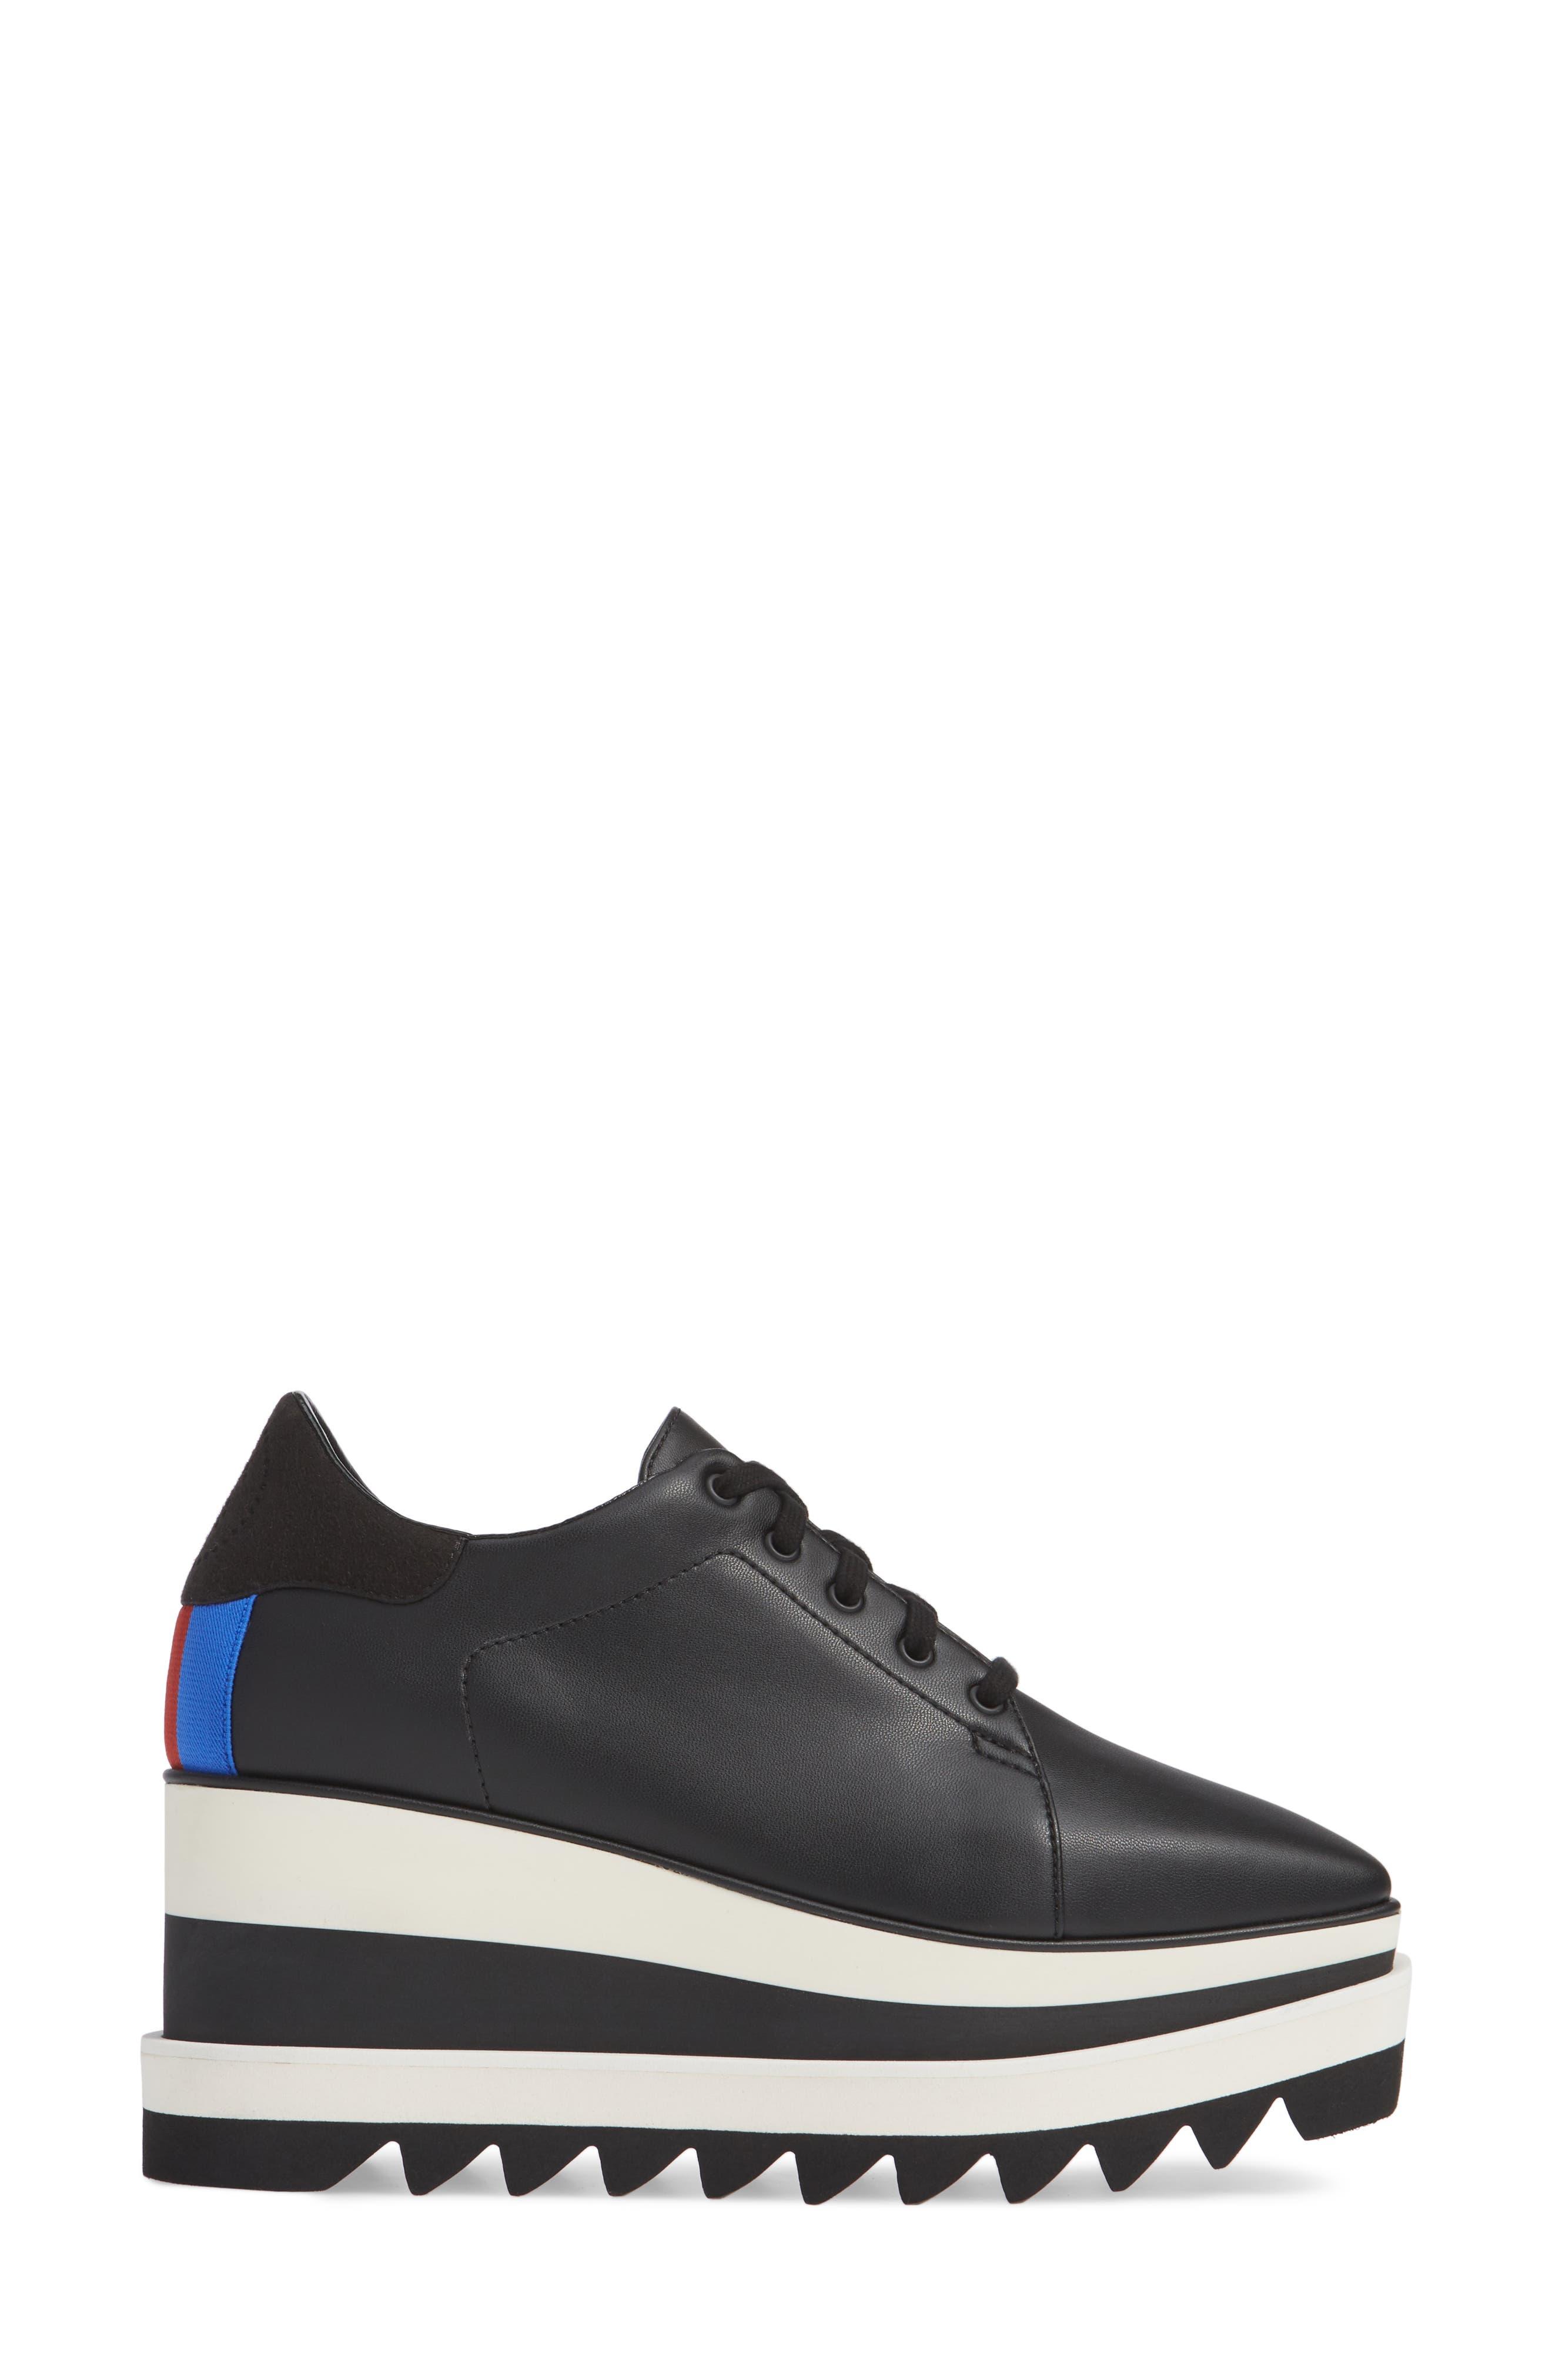 Sneak-Elyse Flatform Sneaker,                             Alternate thumbnail 3, color,                             BLACK